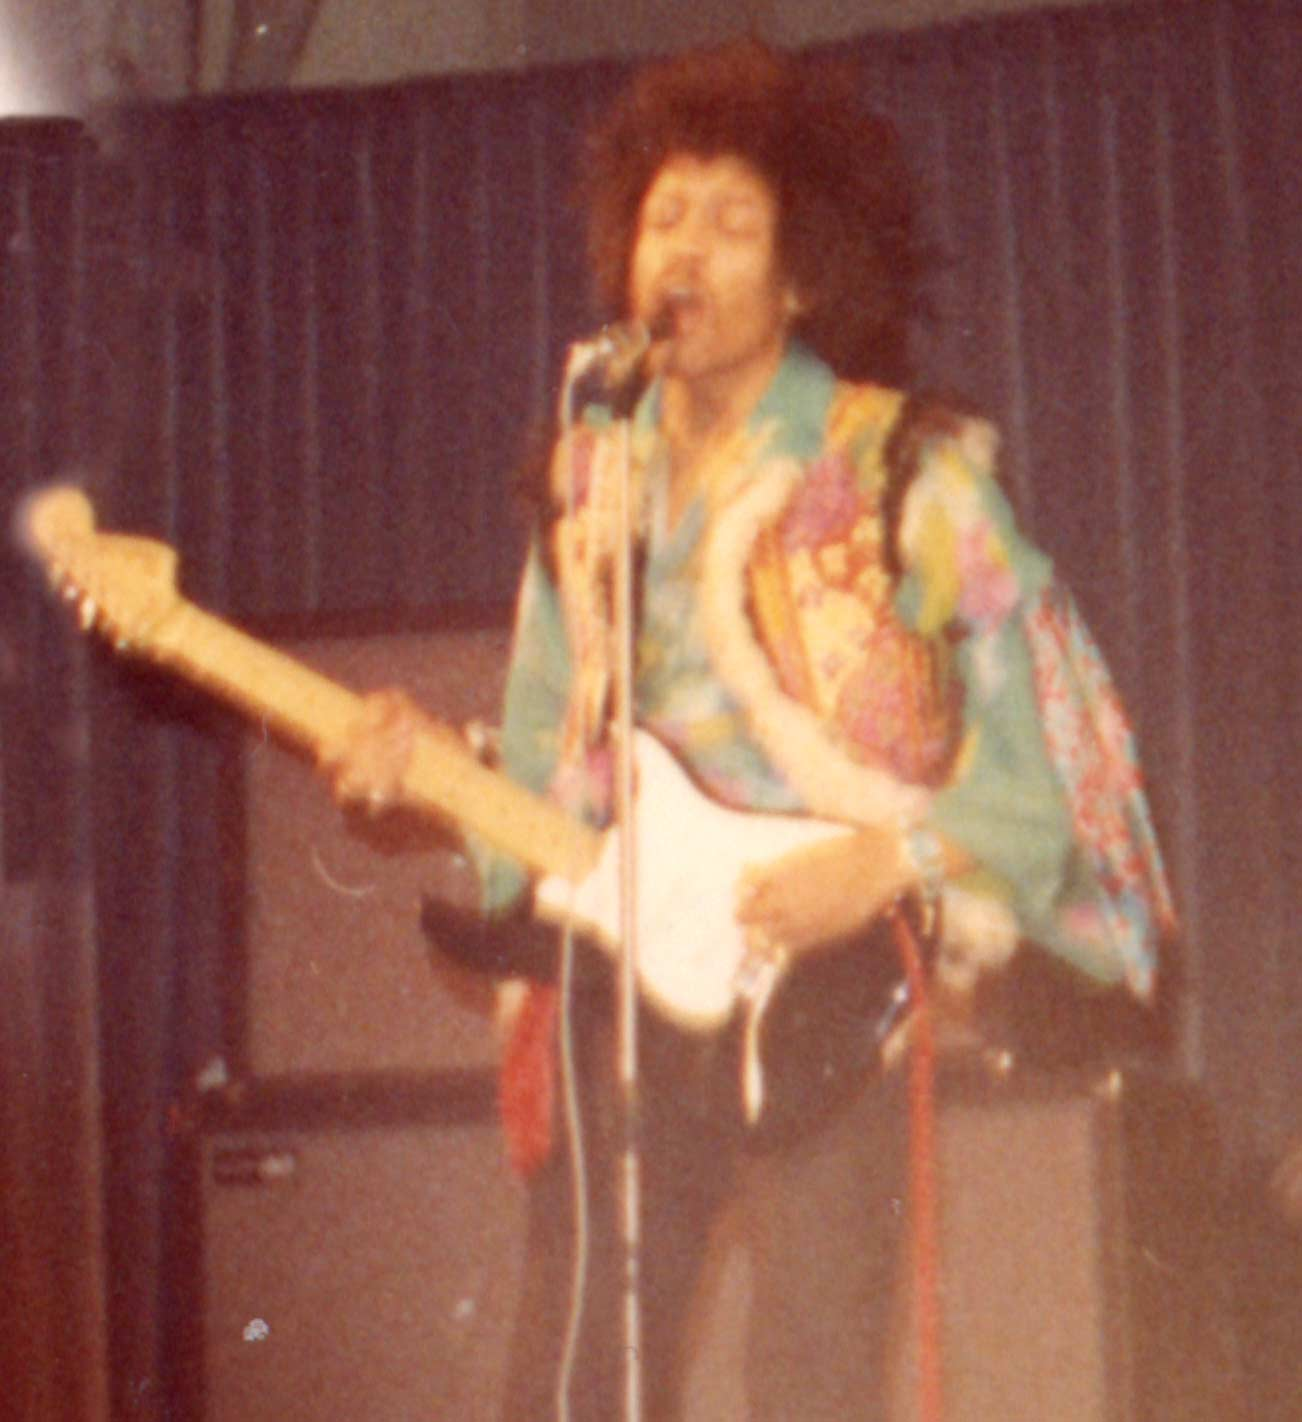 Stockholm (Konserthuset) : 9 janvier 1969 [Second concert]  1cdec077f1f8d59637a8e0c99f0fd807